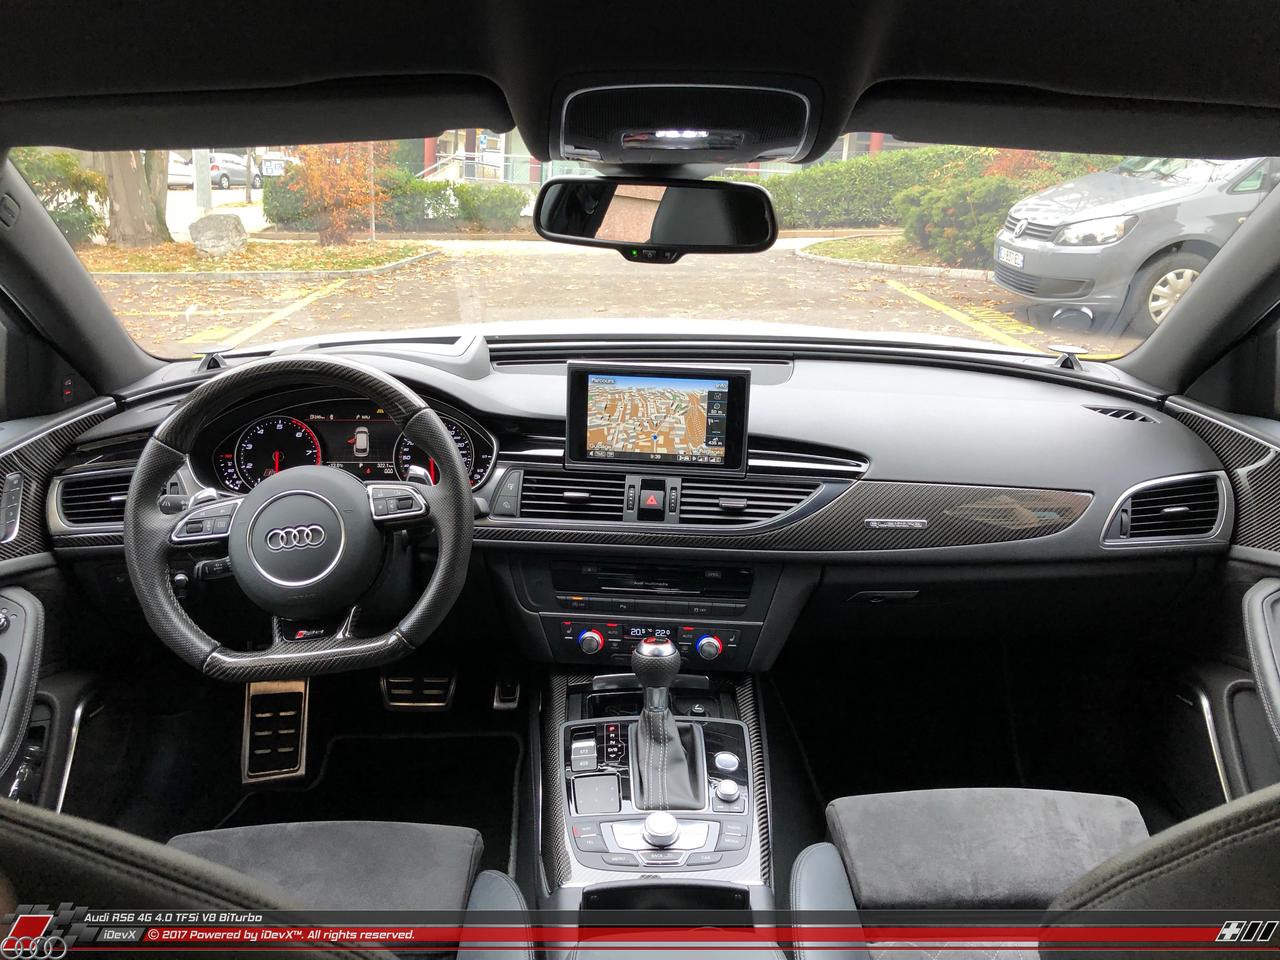 10_11.2018_Audi-RS6_iDevX_000.png